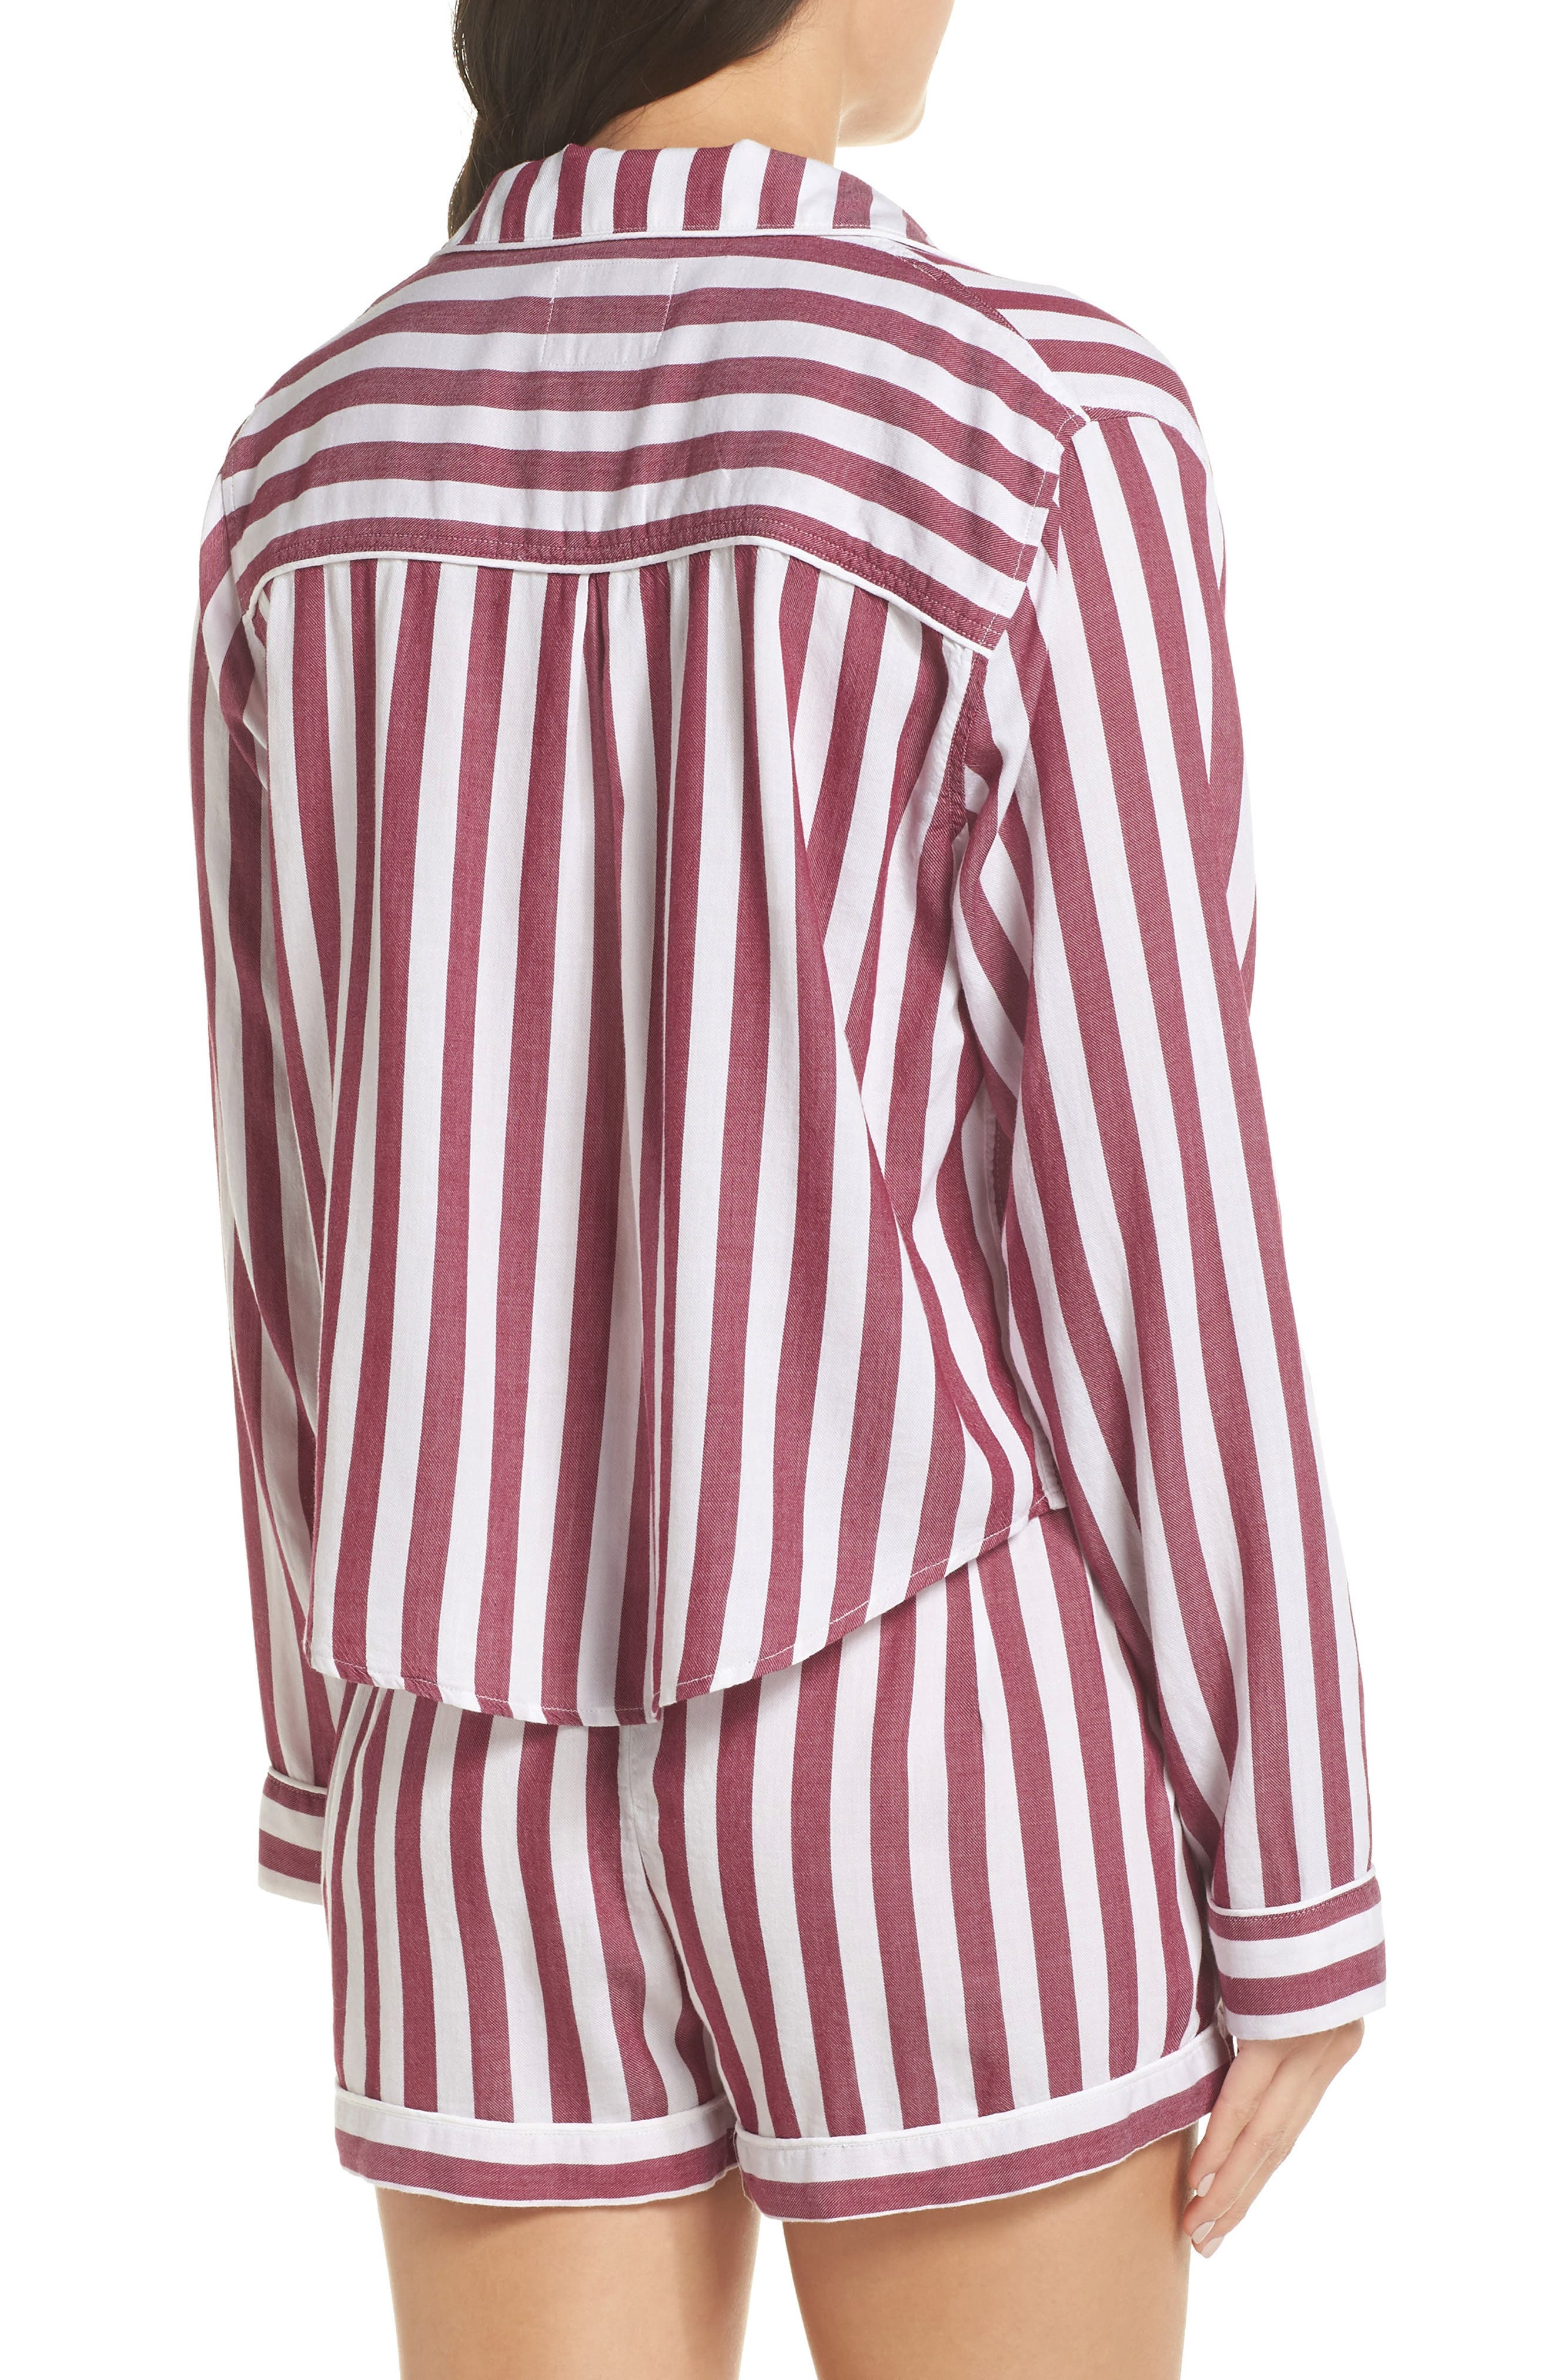 Stripe Short Pajamas,                             Alternate thumbnail 2, color,                             TOLEDO STRIPE